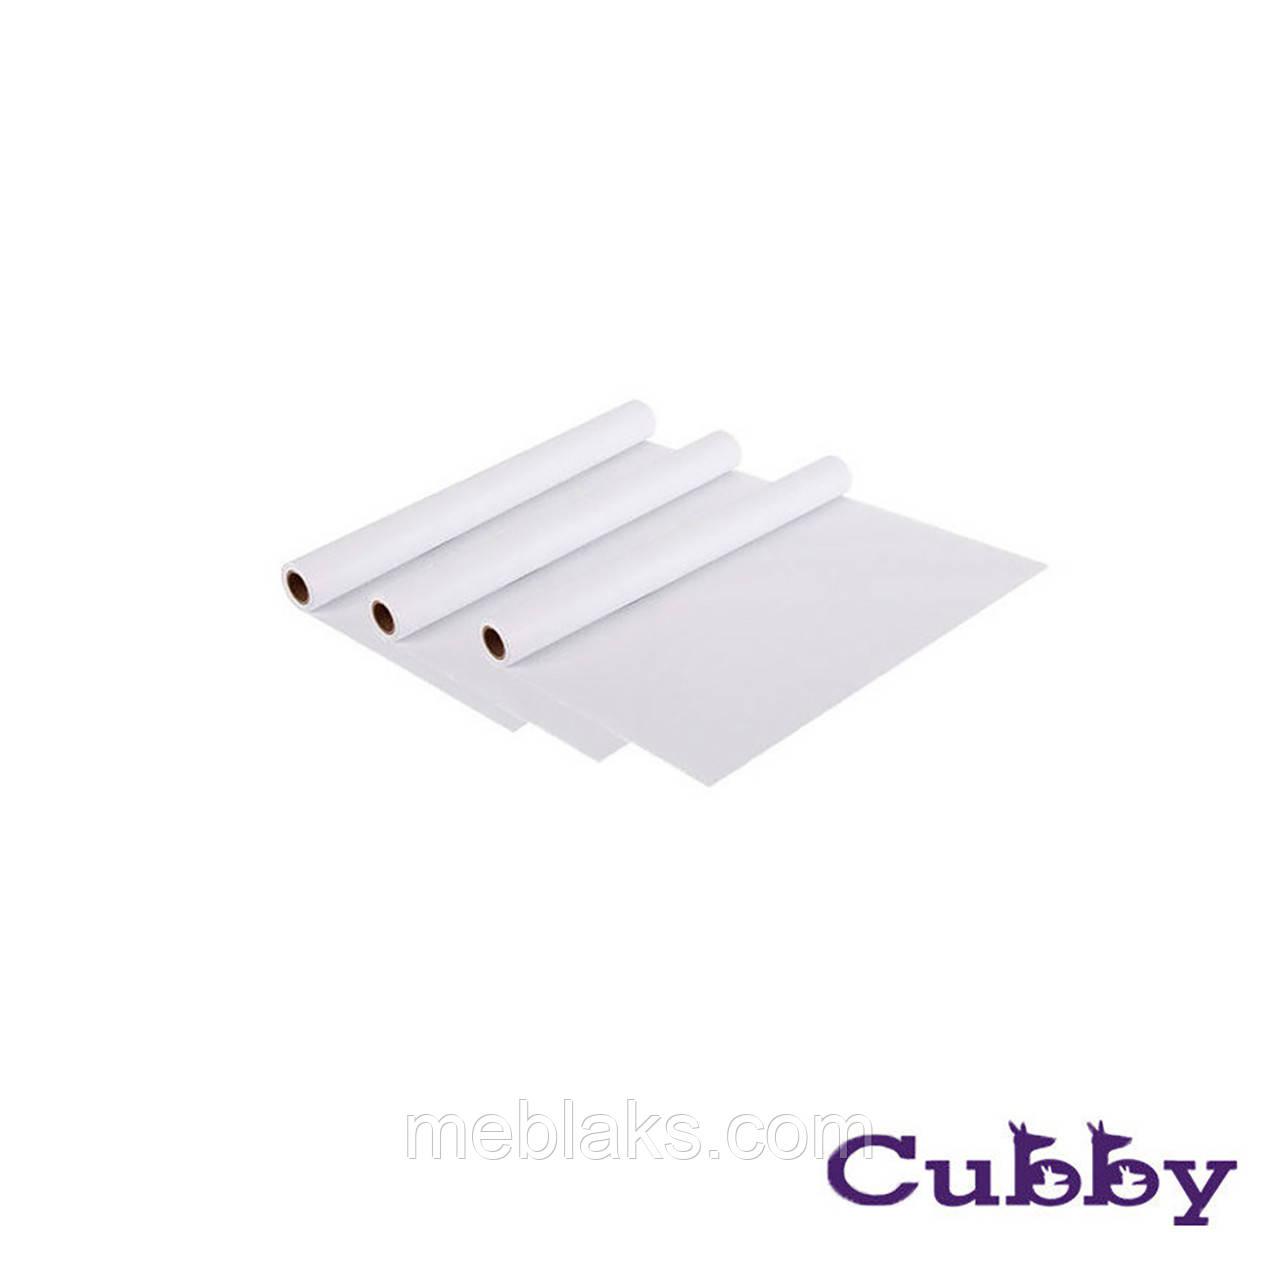 Комплект бумаги для парт Cubby MA4-3